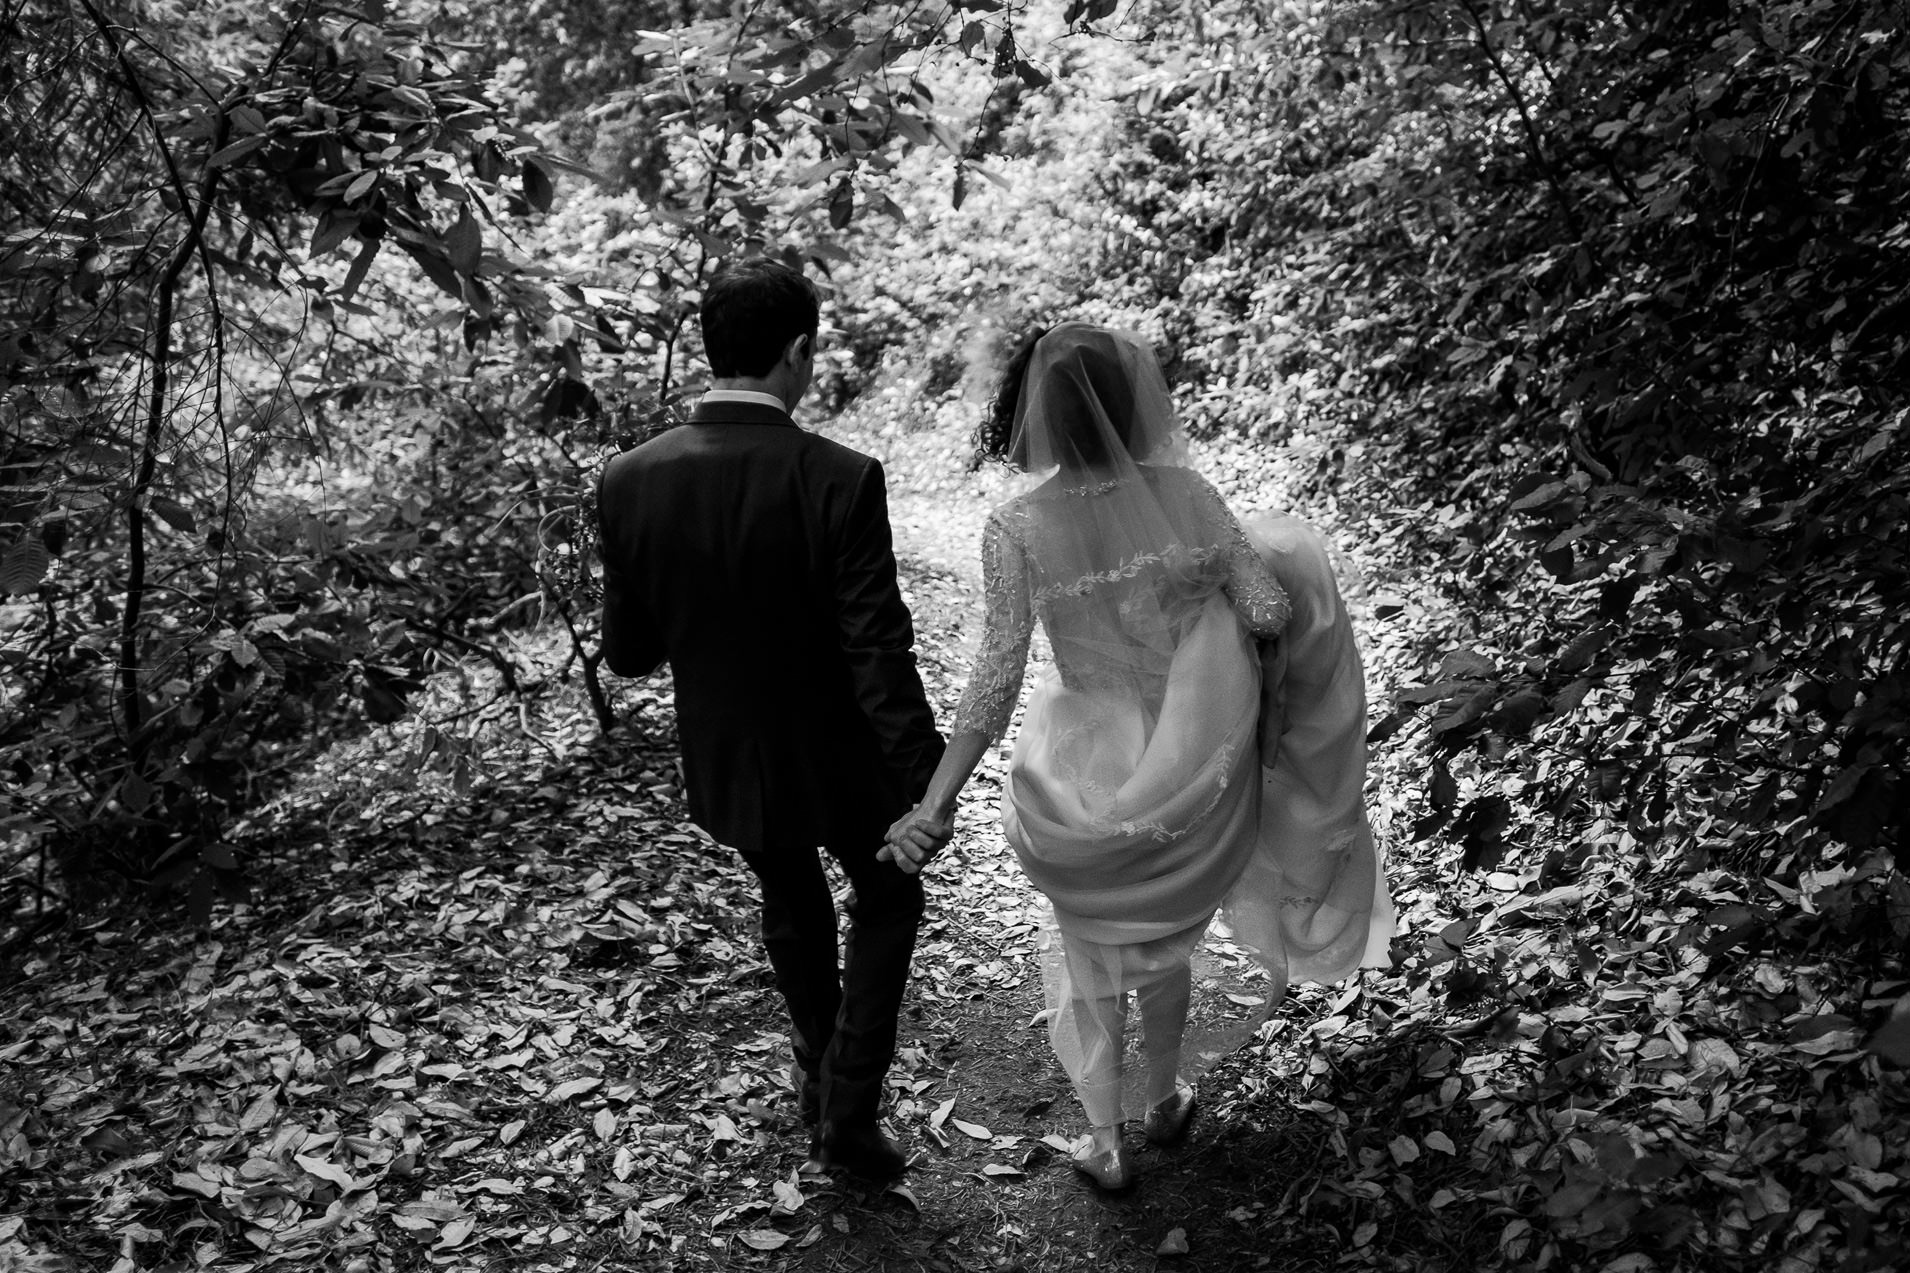 sequoia retreat centre wedding